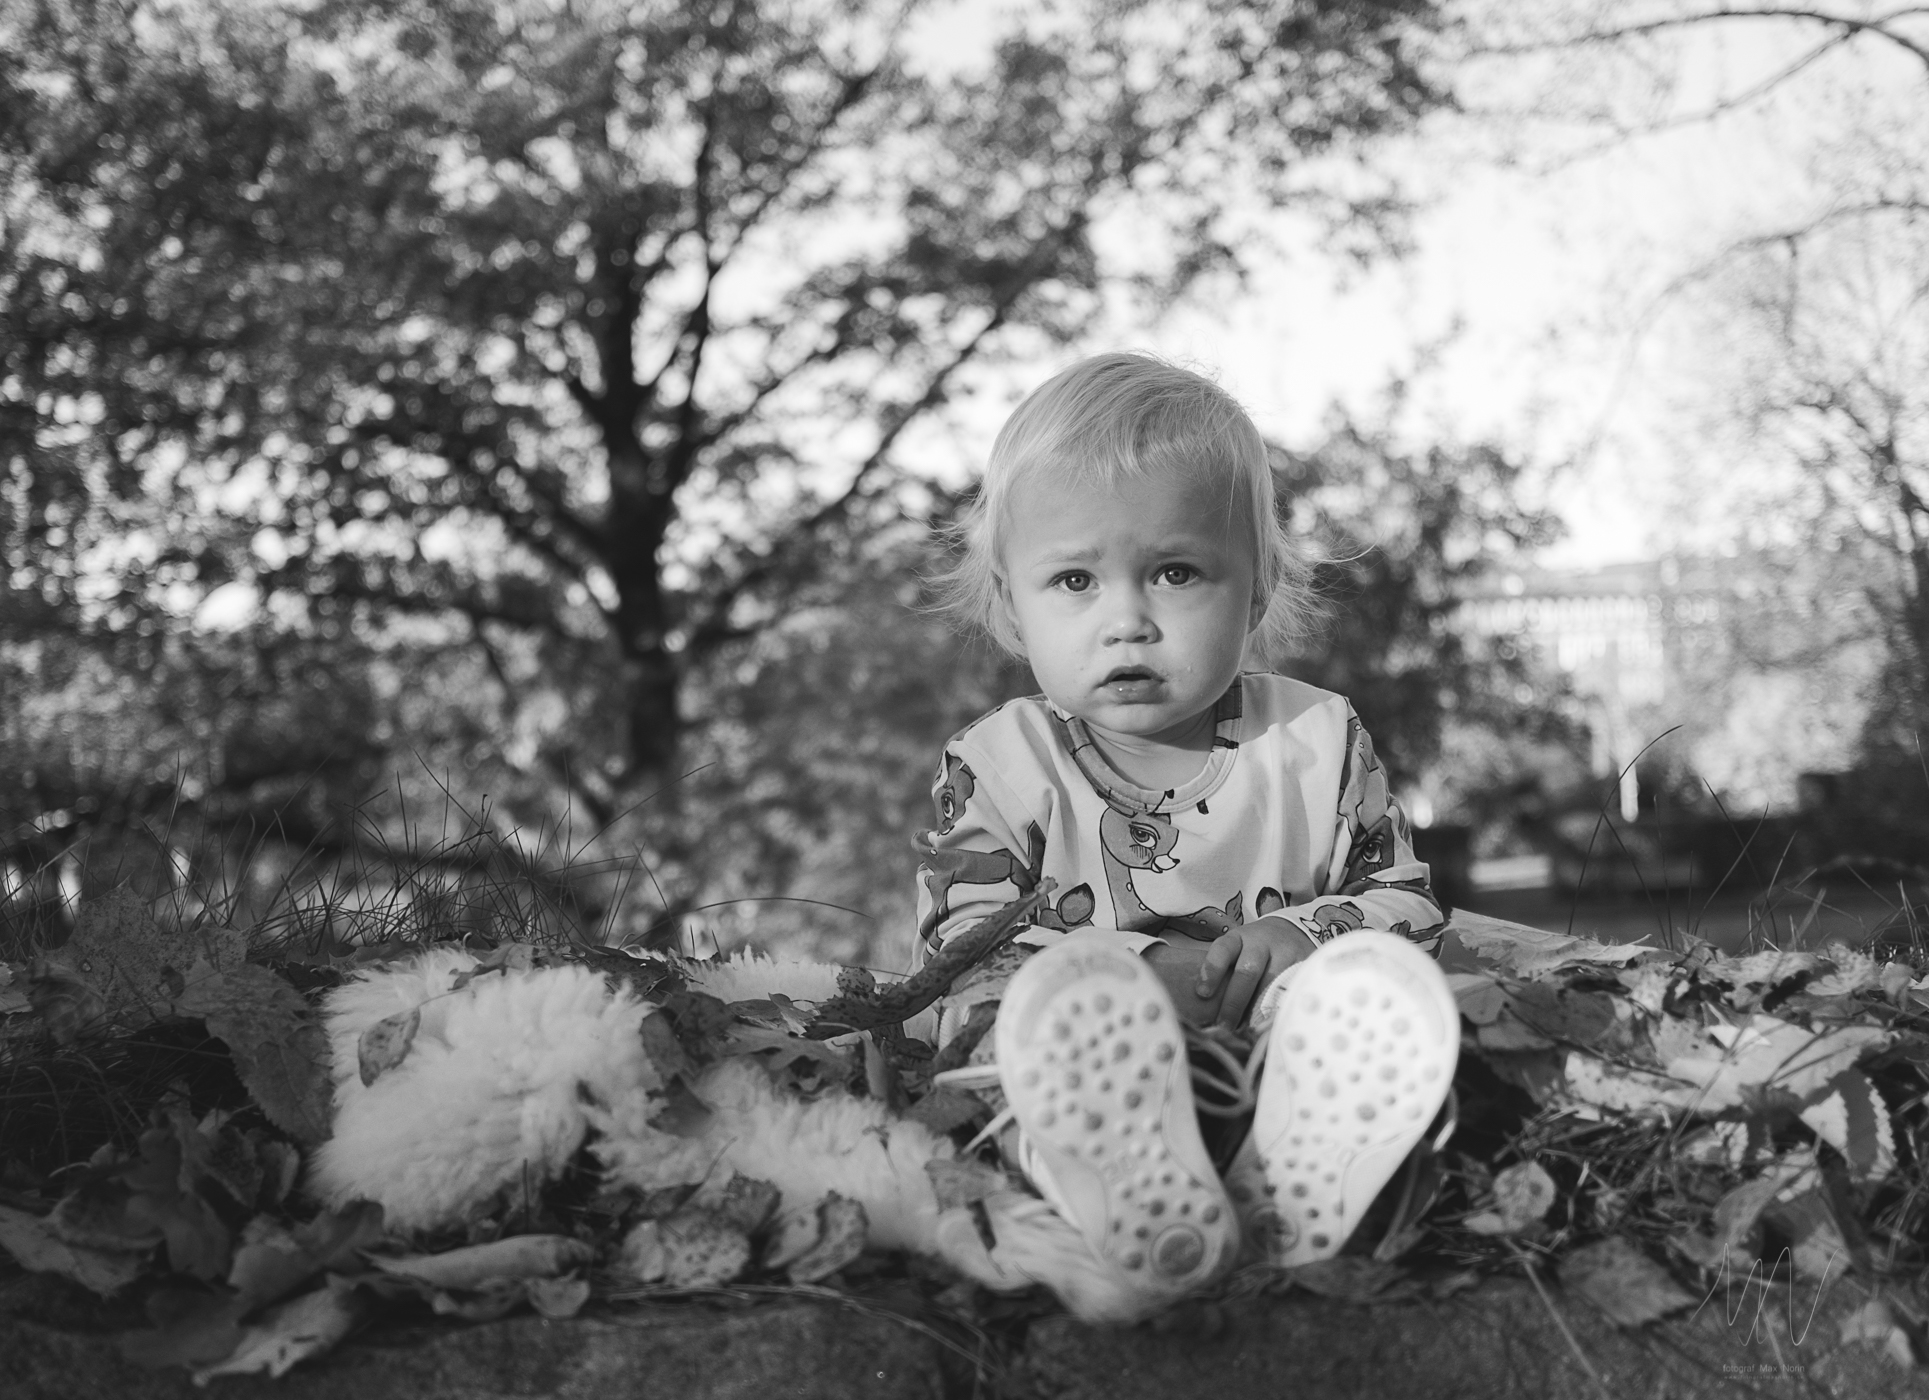 barnfoto_fotograf_max_norin-9.jpg